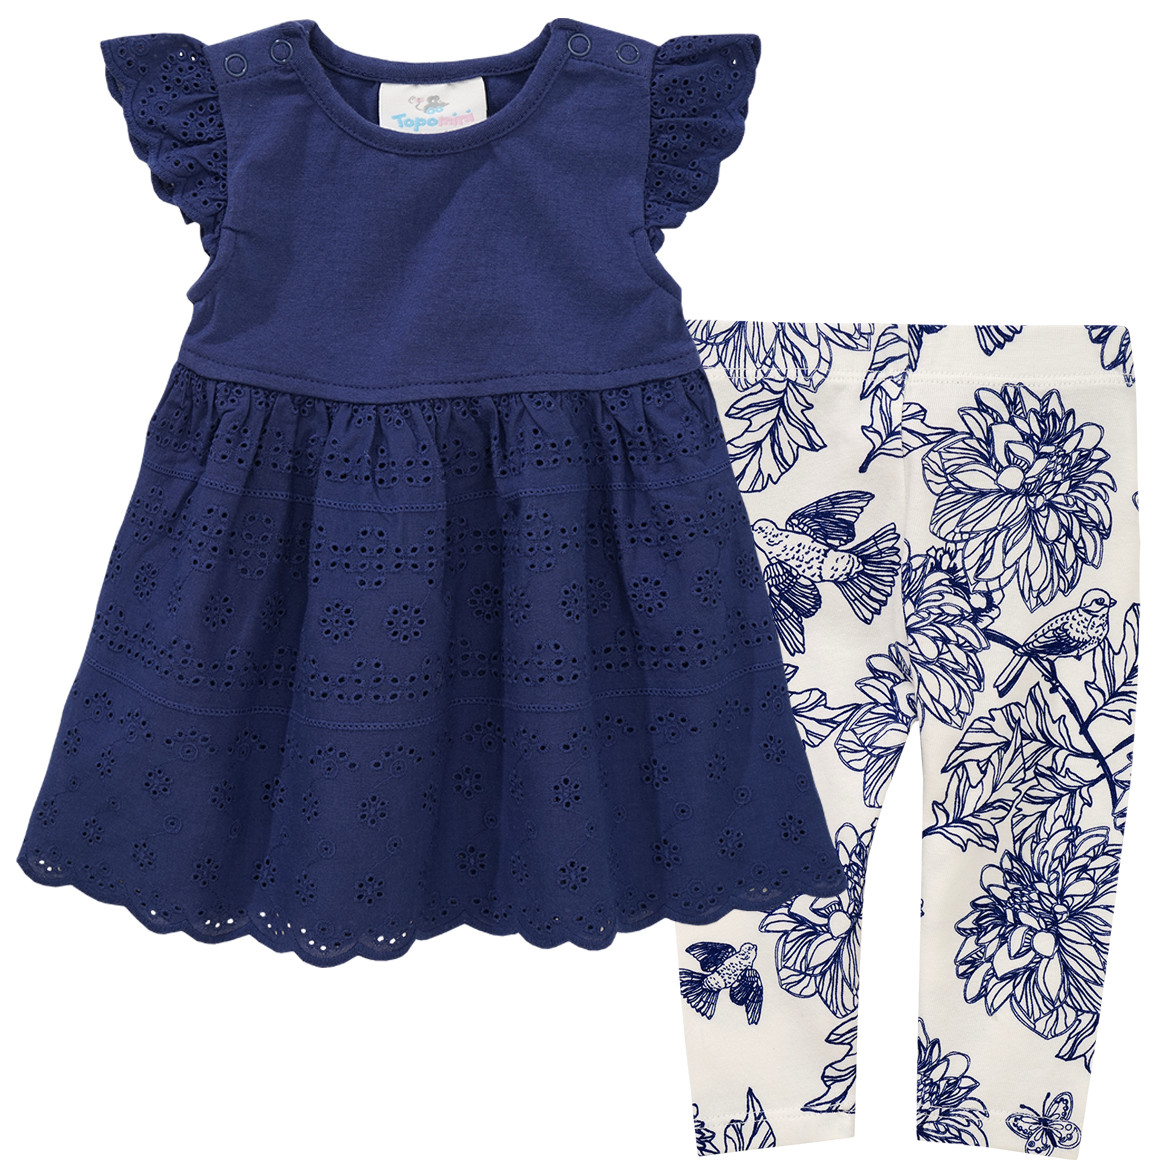 Newborn Kleid und Leggings